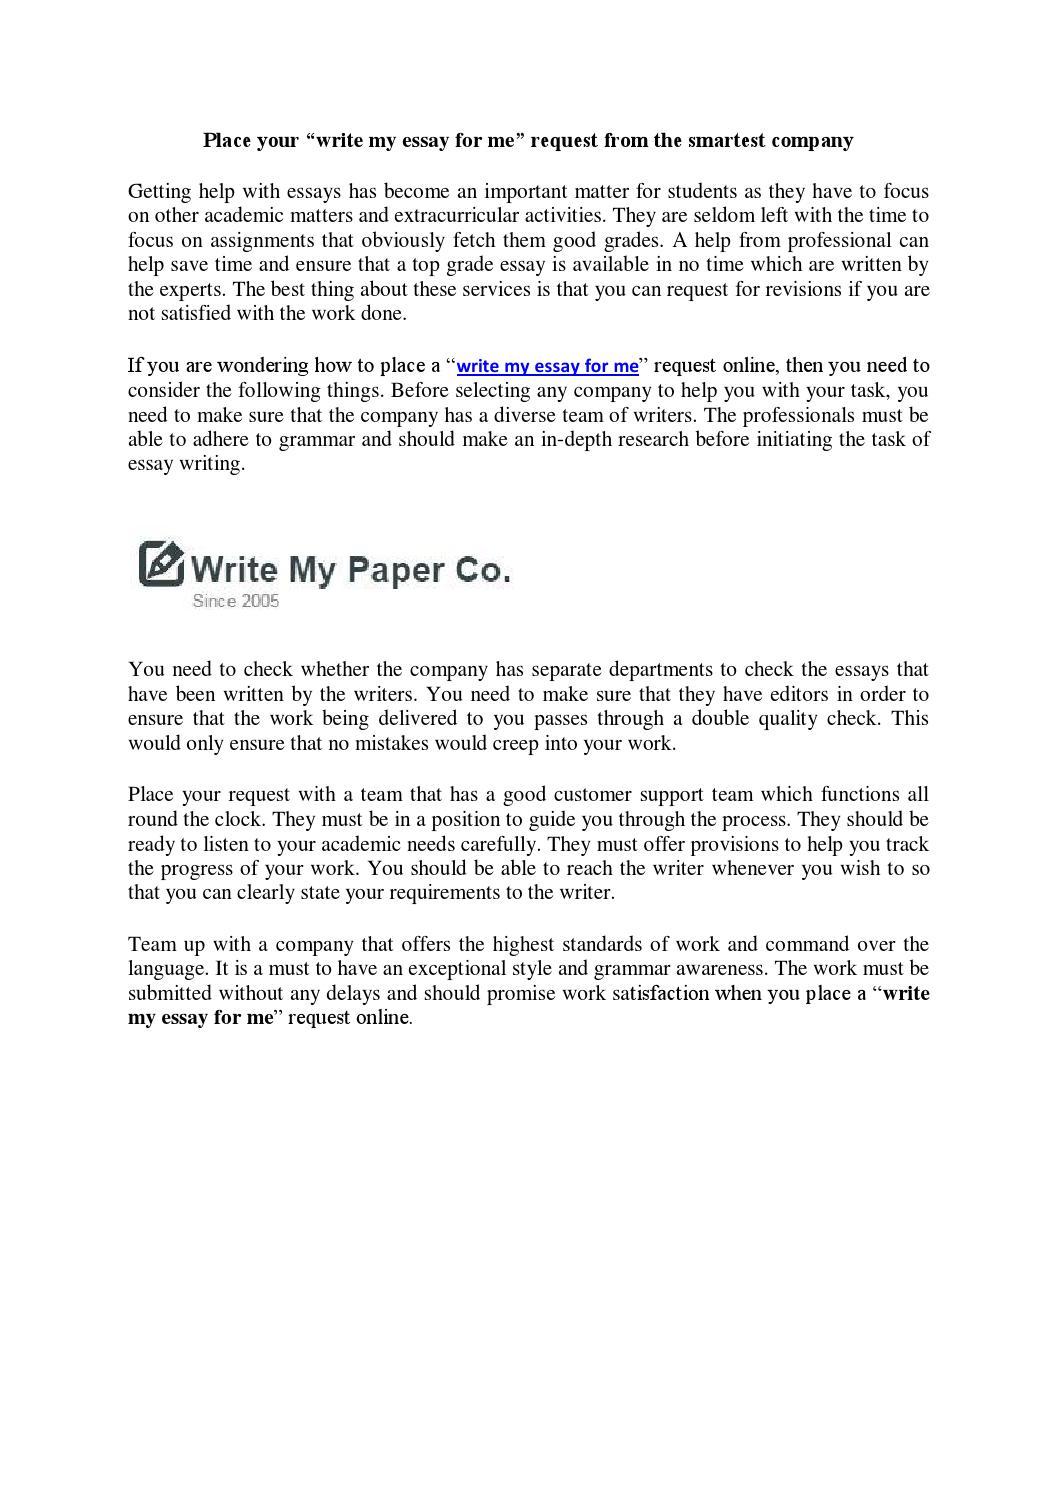 Buying essays online plagiarism websites